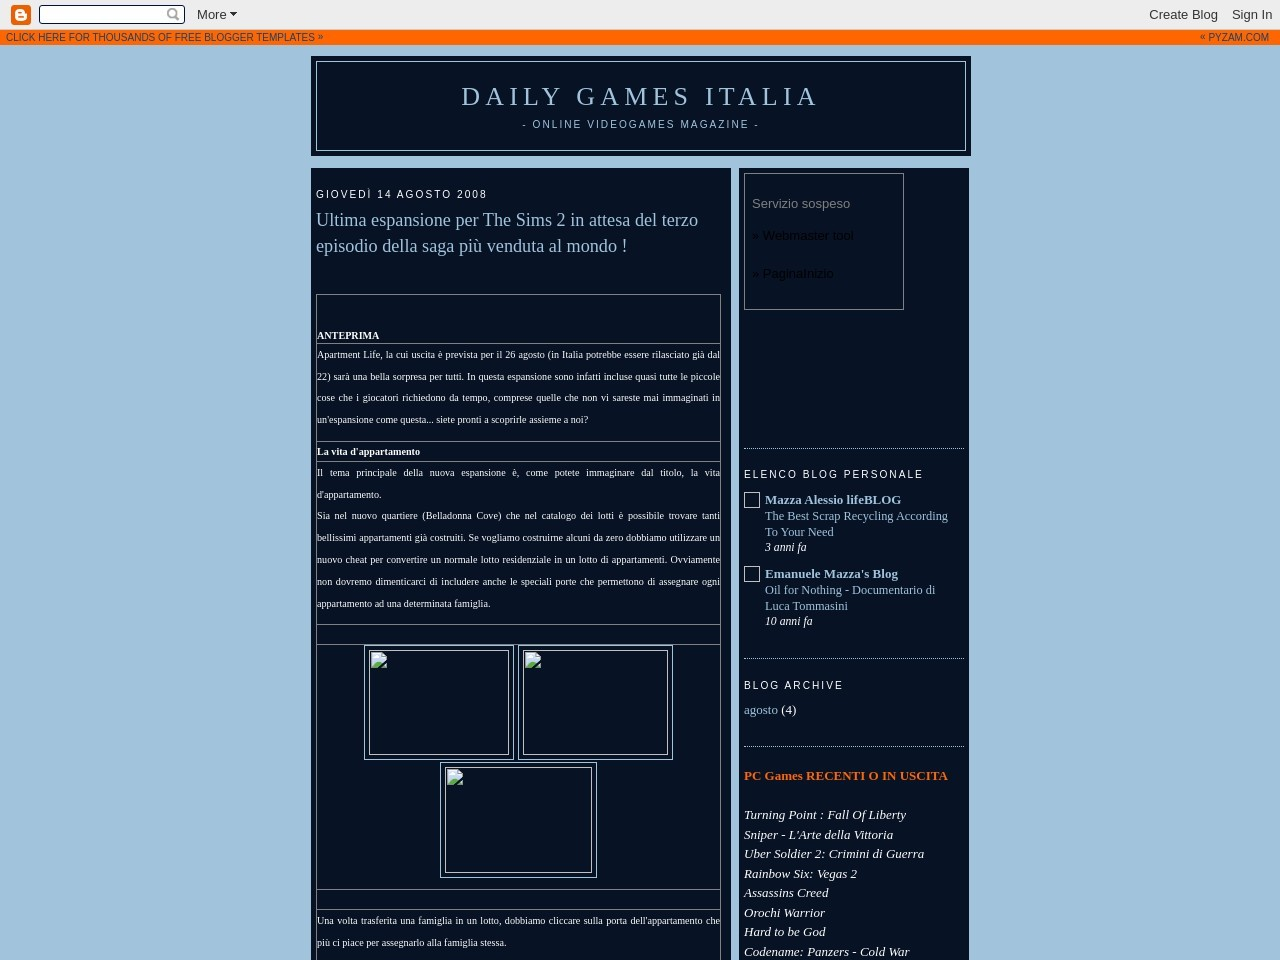 daily-games-italia